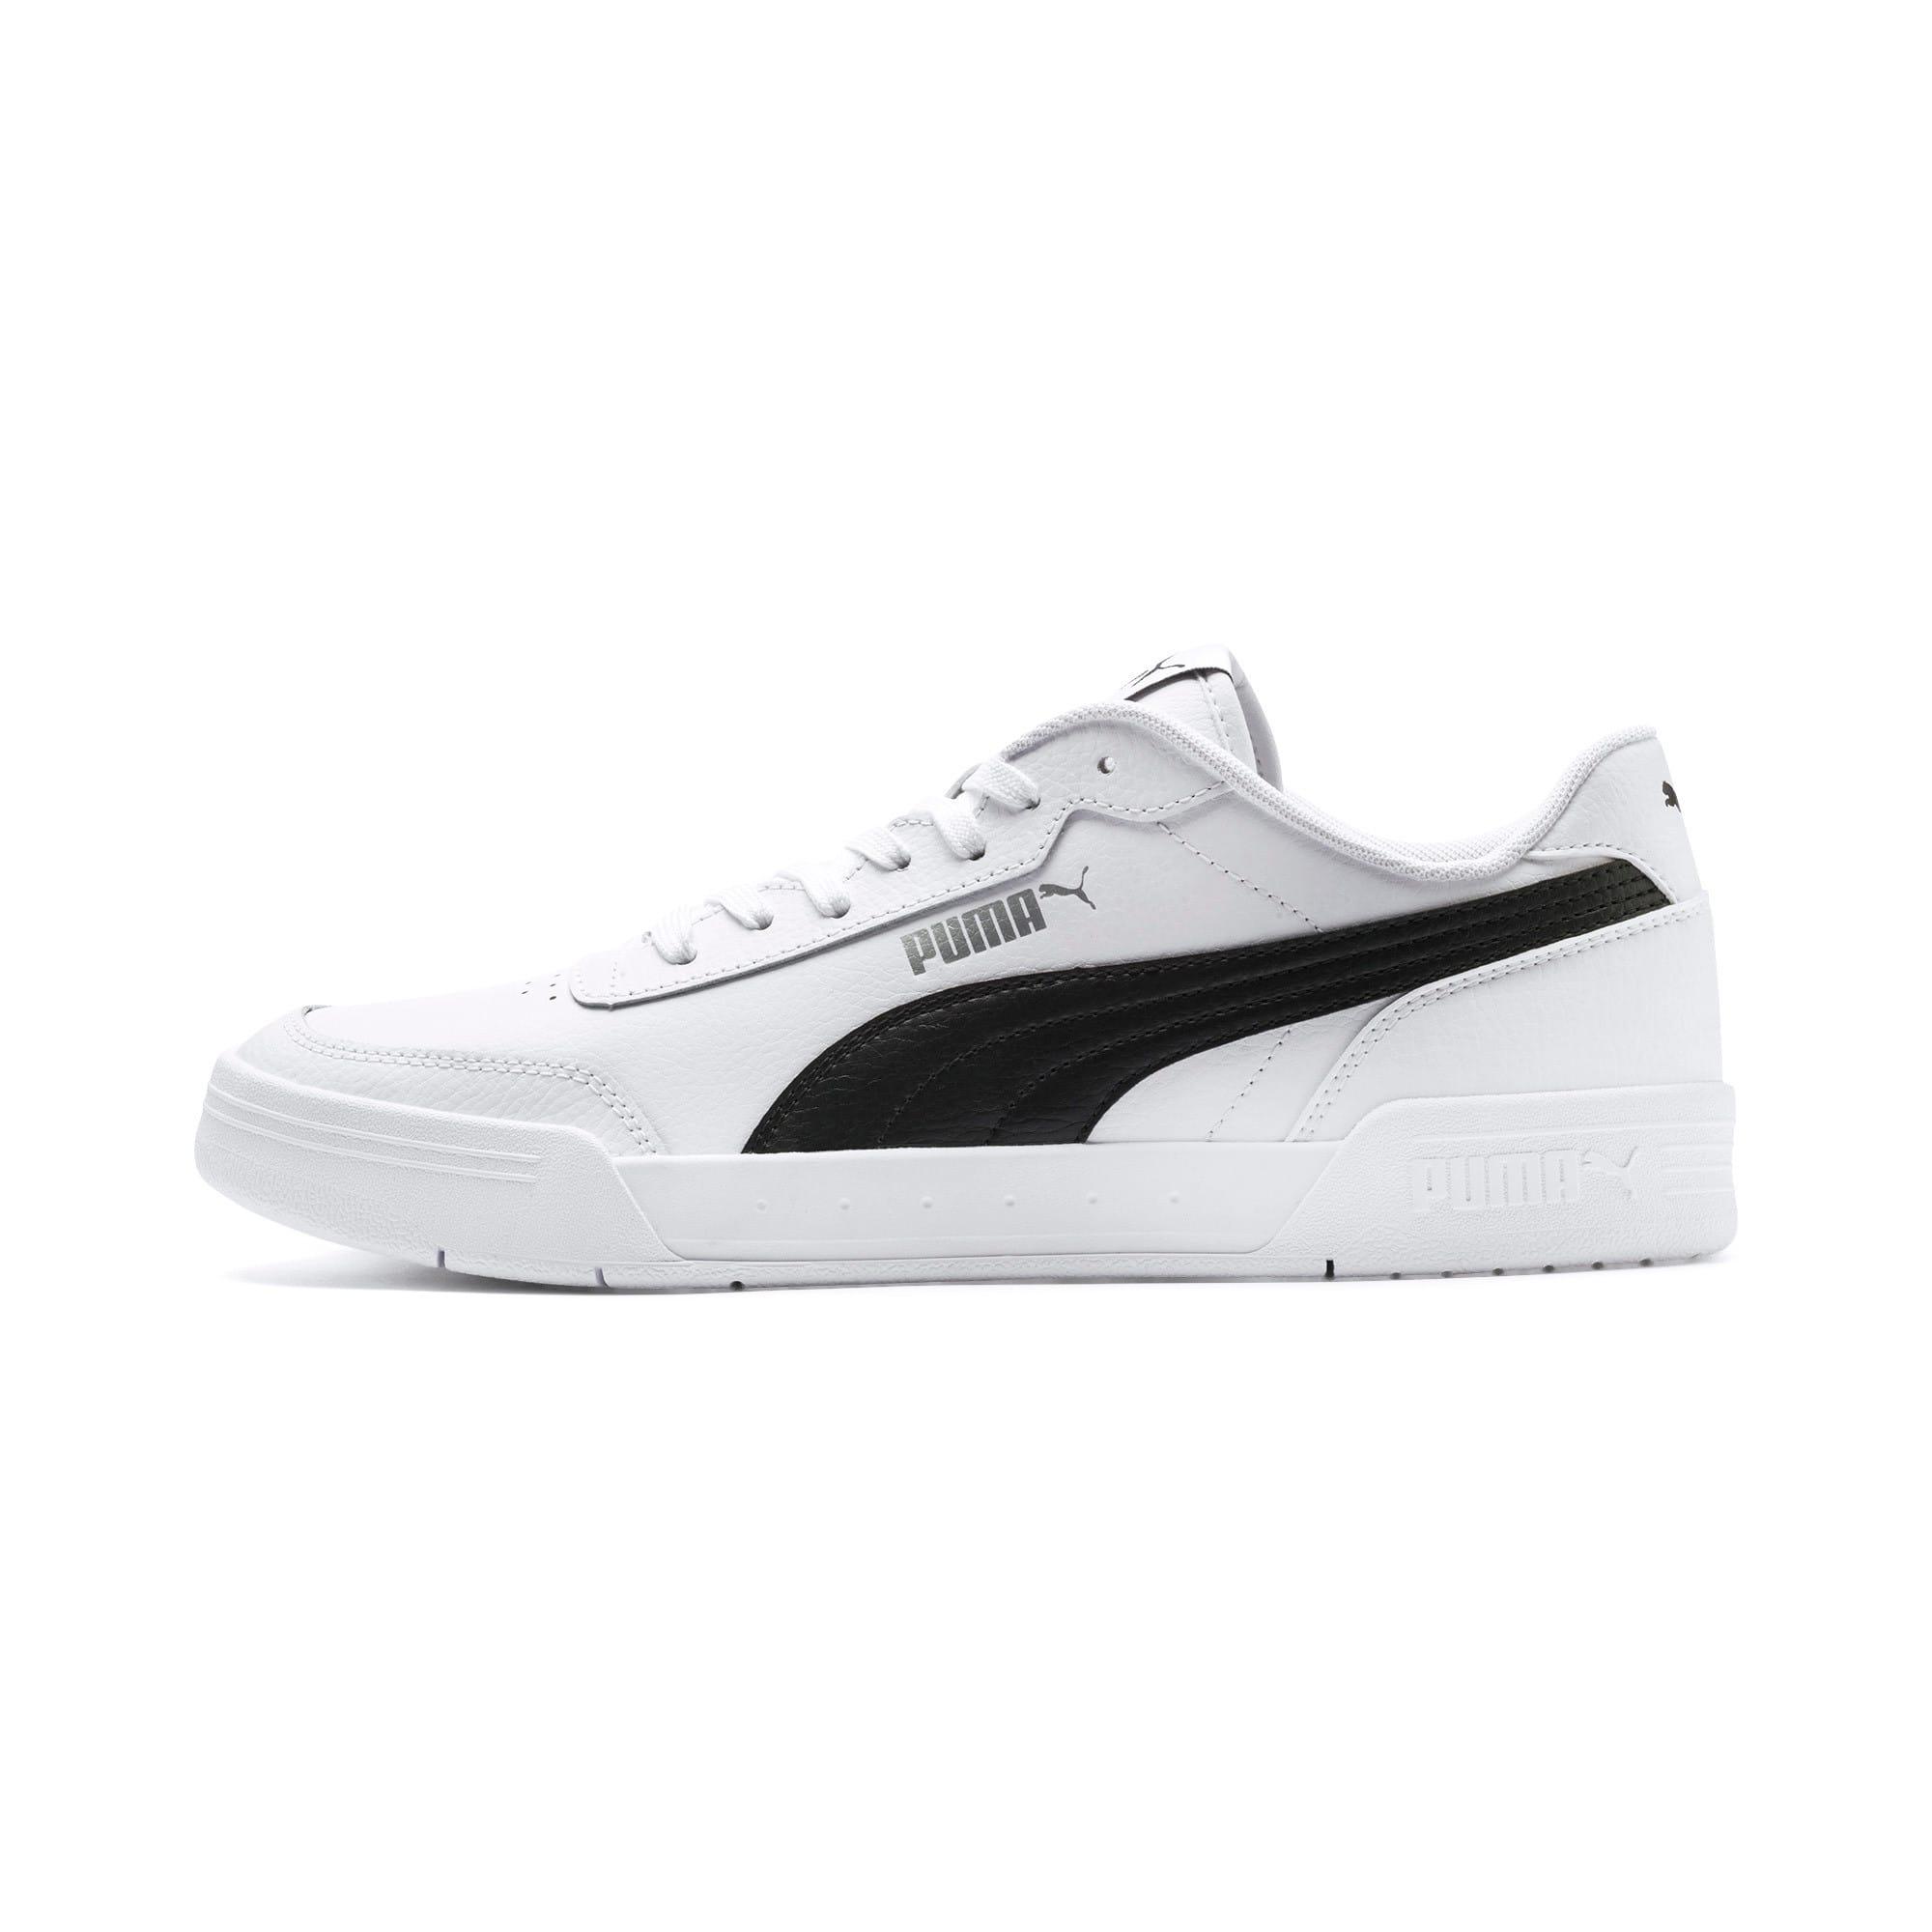 Thumbnail 1 of Caracal Sneakers, Puma White-Puma Black, medium